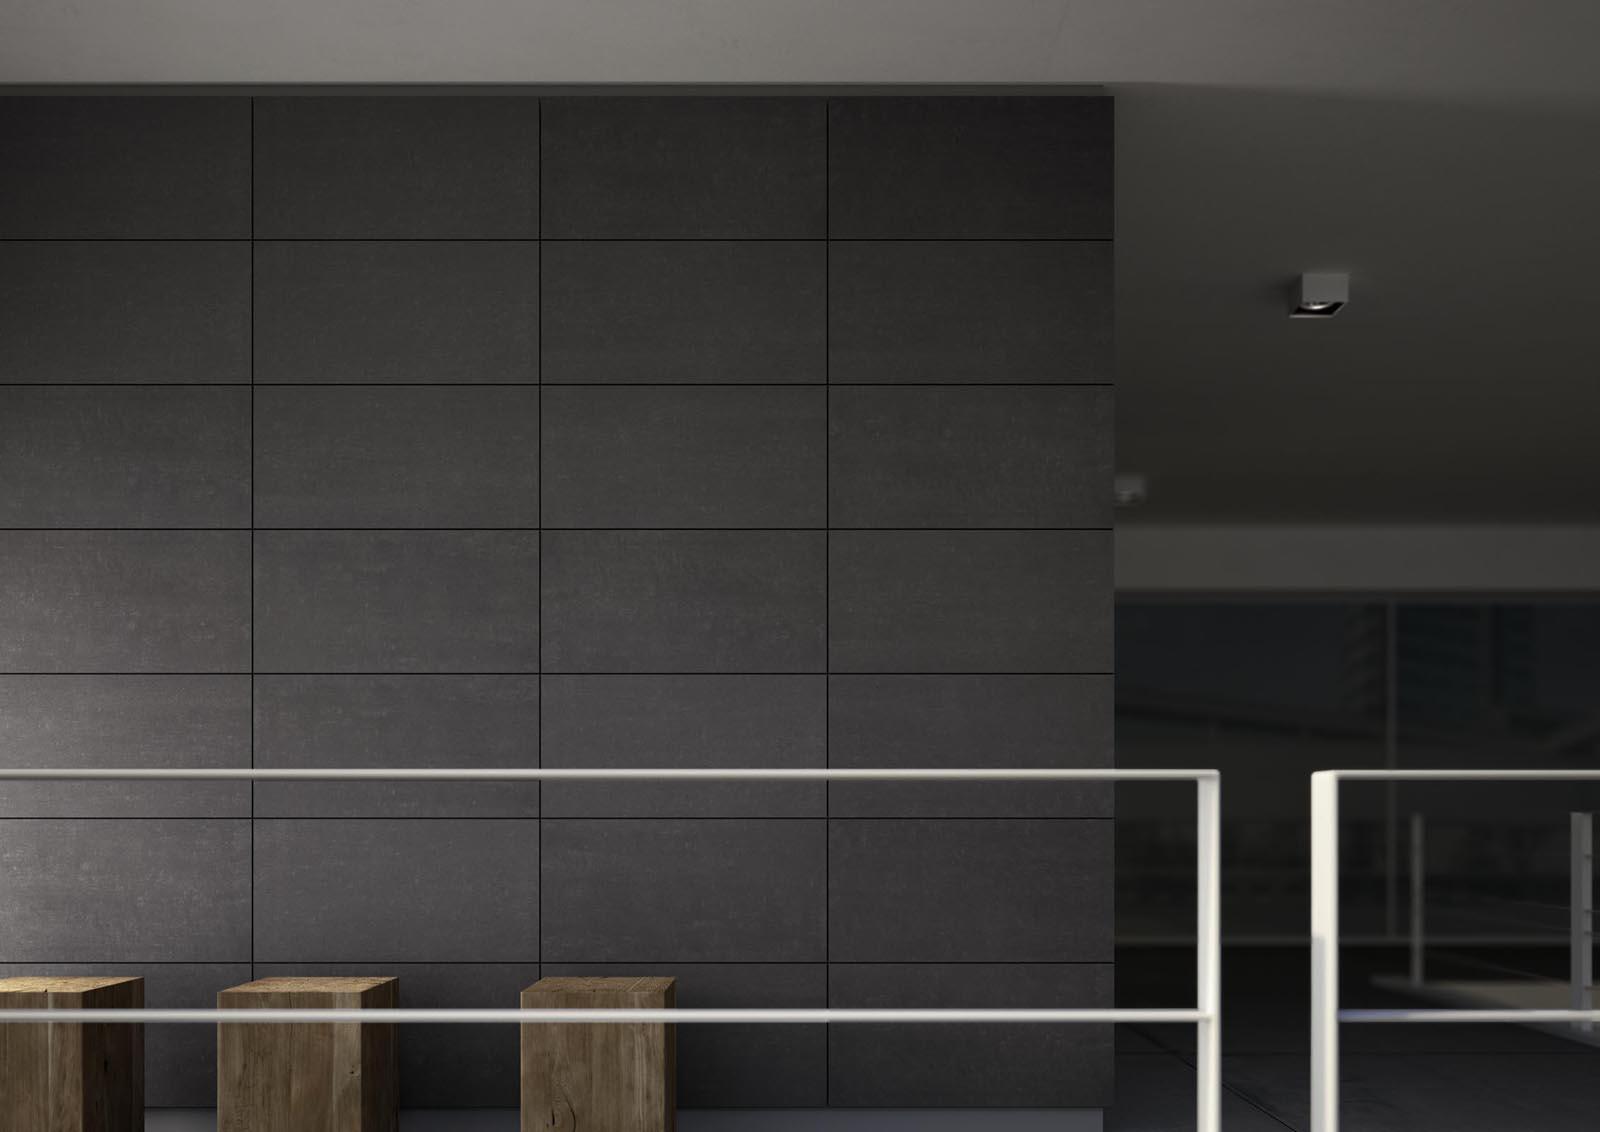 marazzi italy sistem n 14 lemit. Black Bedroom Furniture Sets. Home Design Ideas